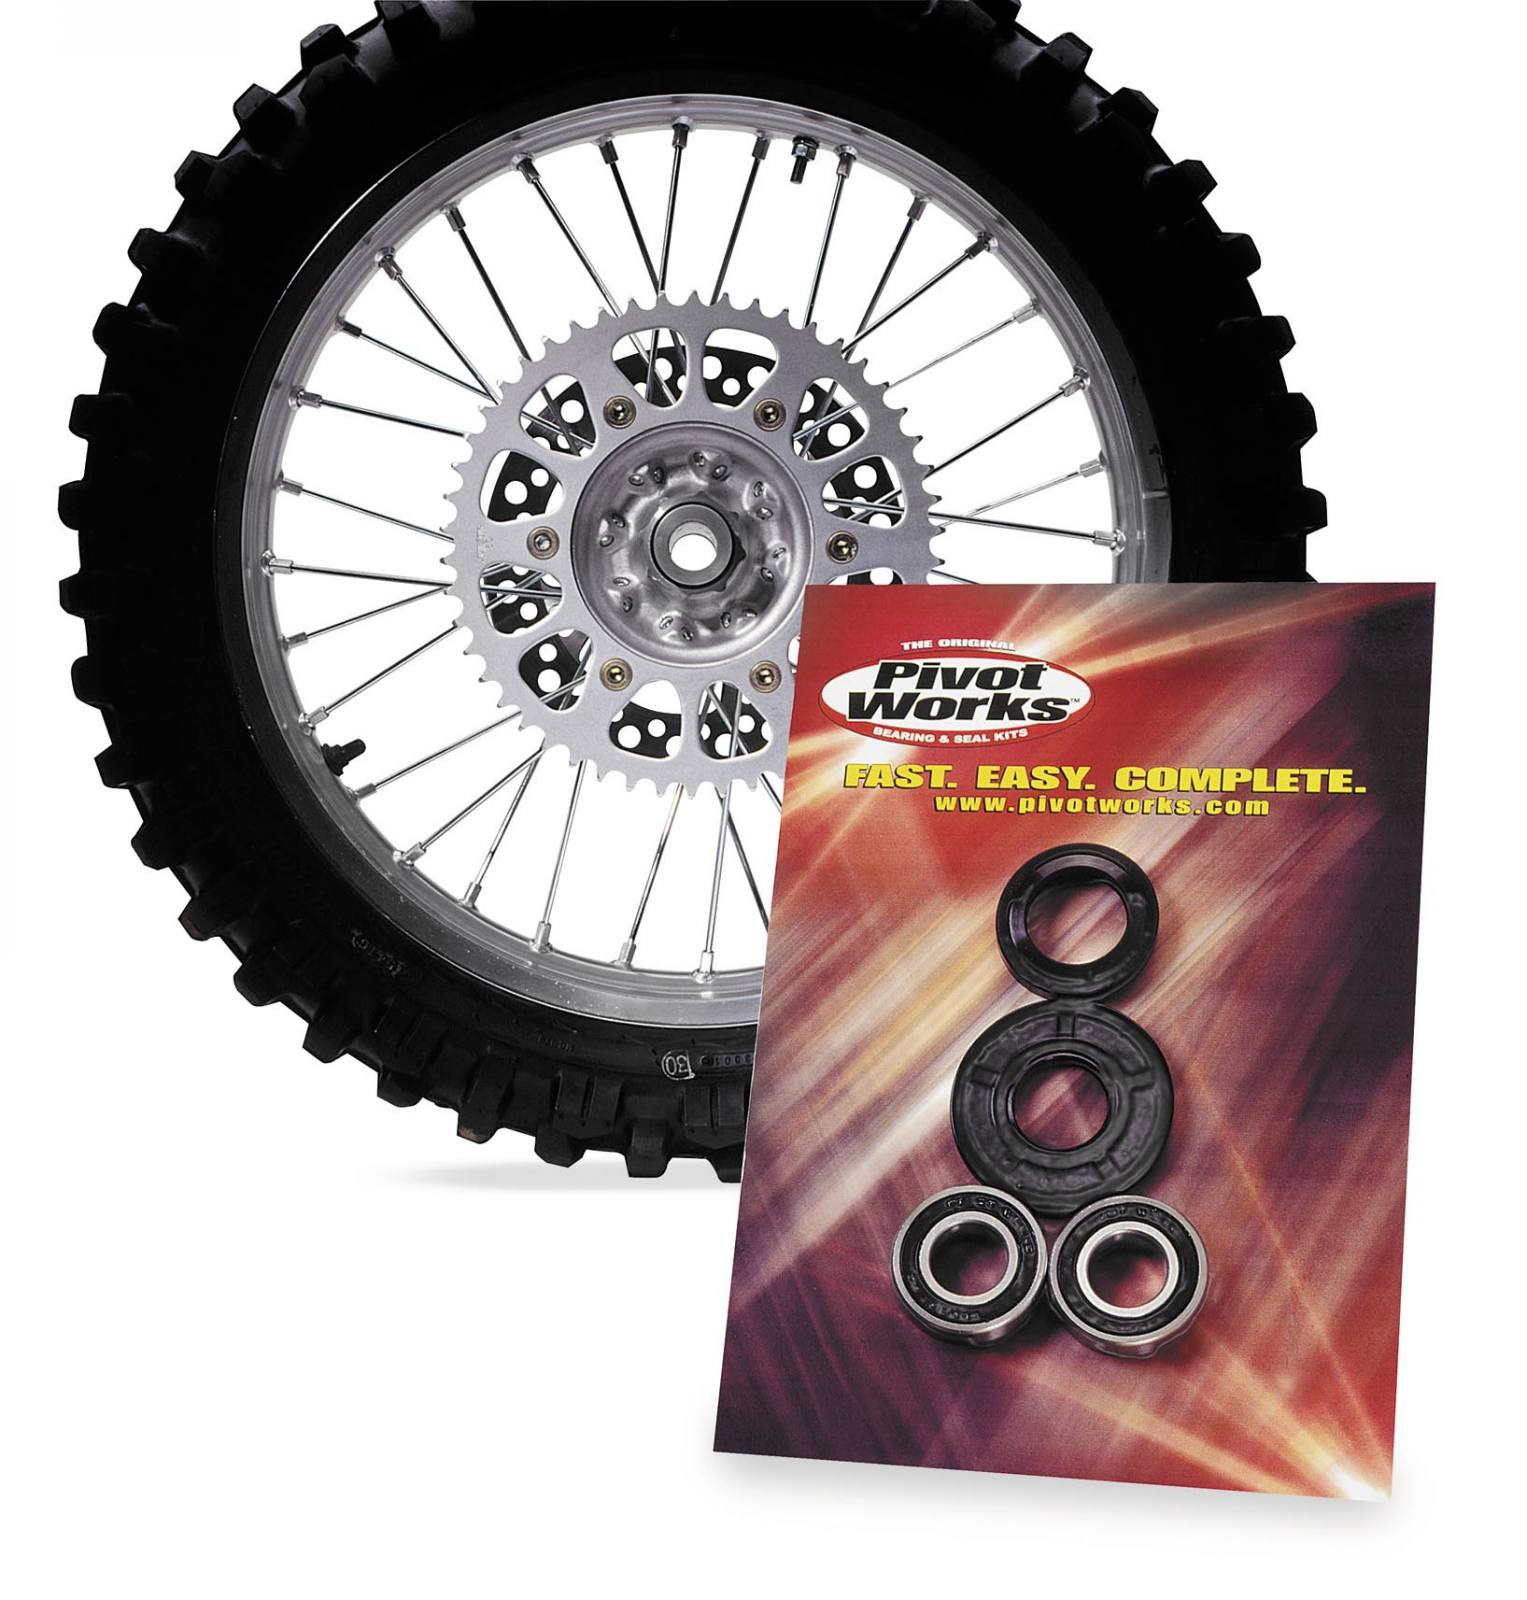 Wheel Bearing and Seal Kit For 2009 Kawasaki KRF750 Teryx FI 4x4 LE~All Balls